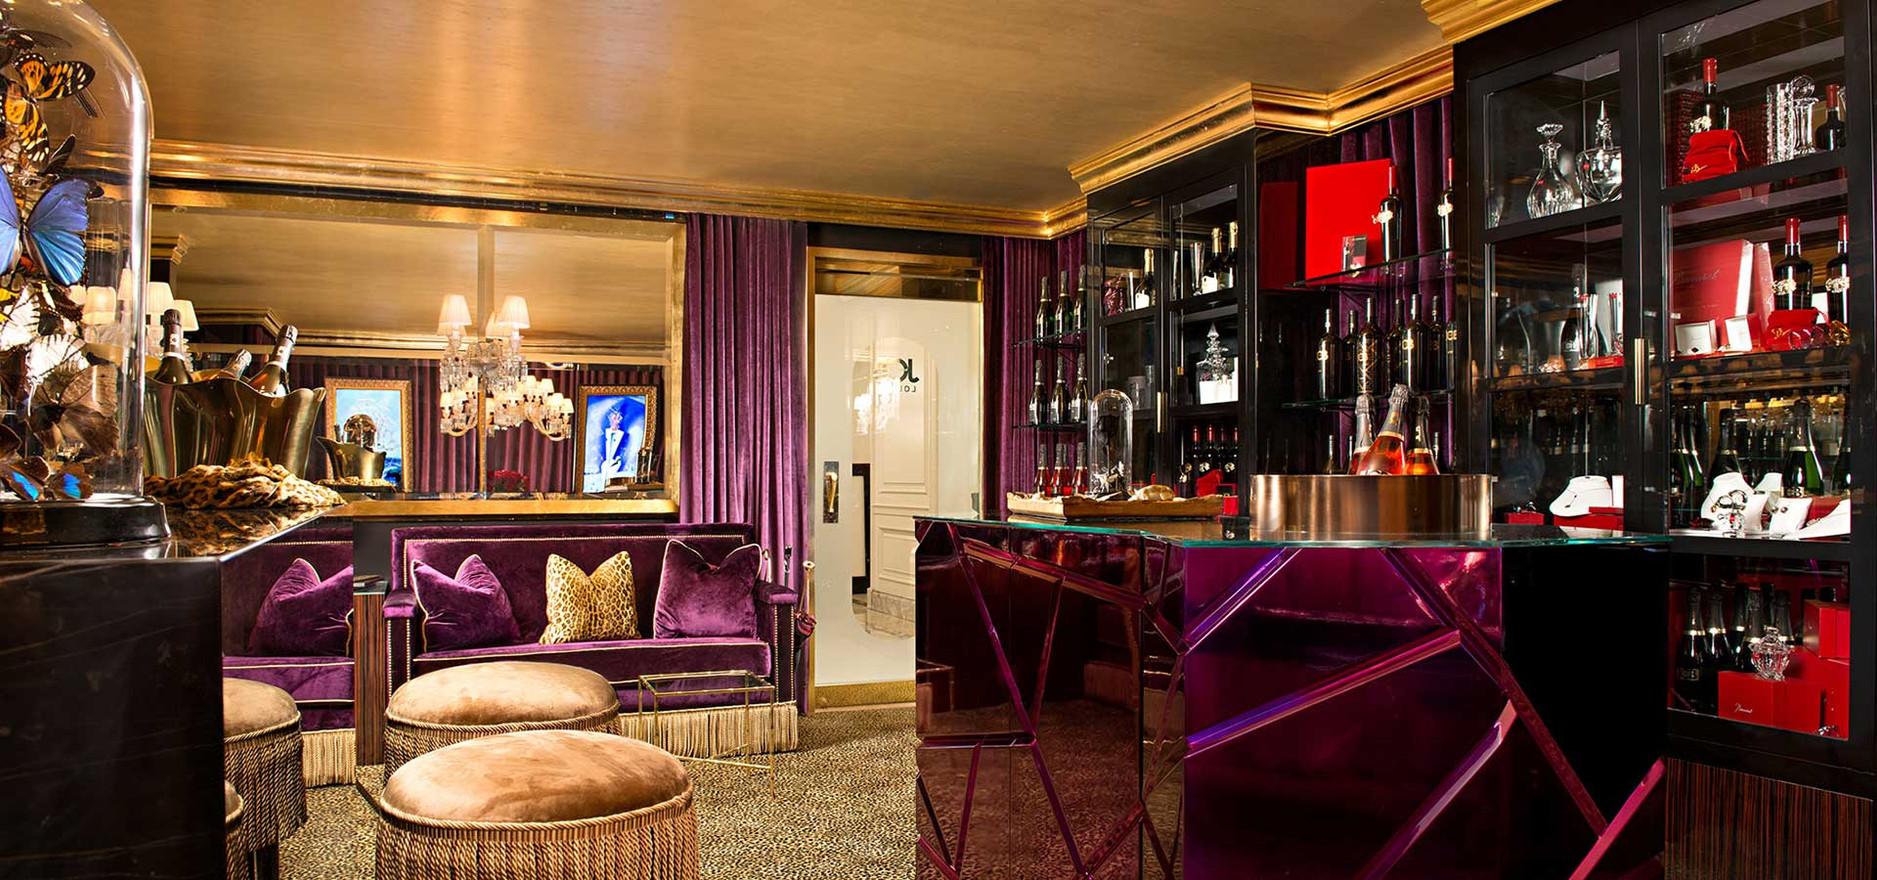 JCB Tasting Lounge - Ritz Carlton